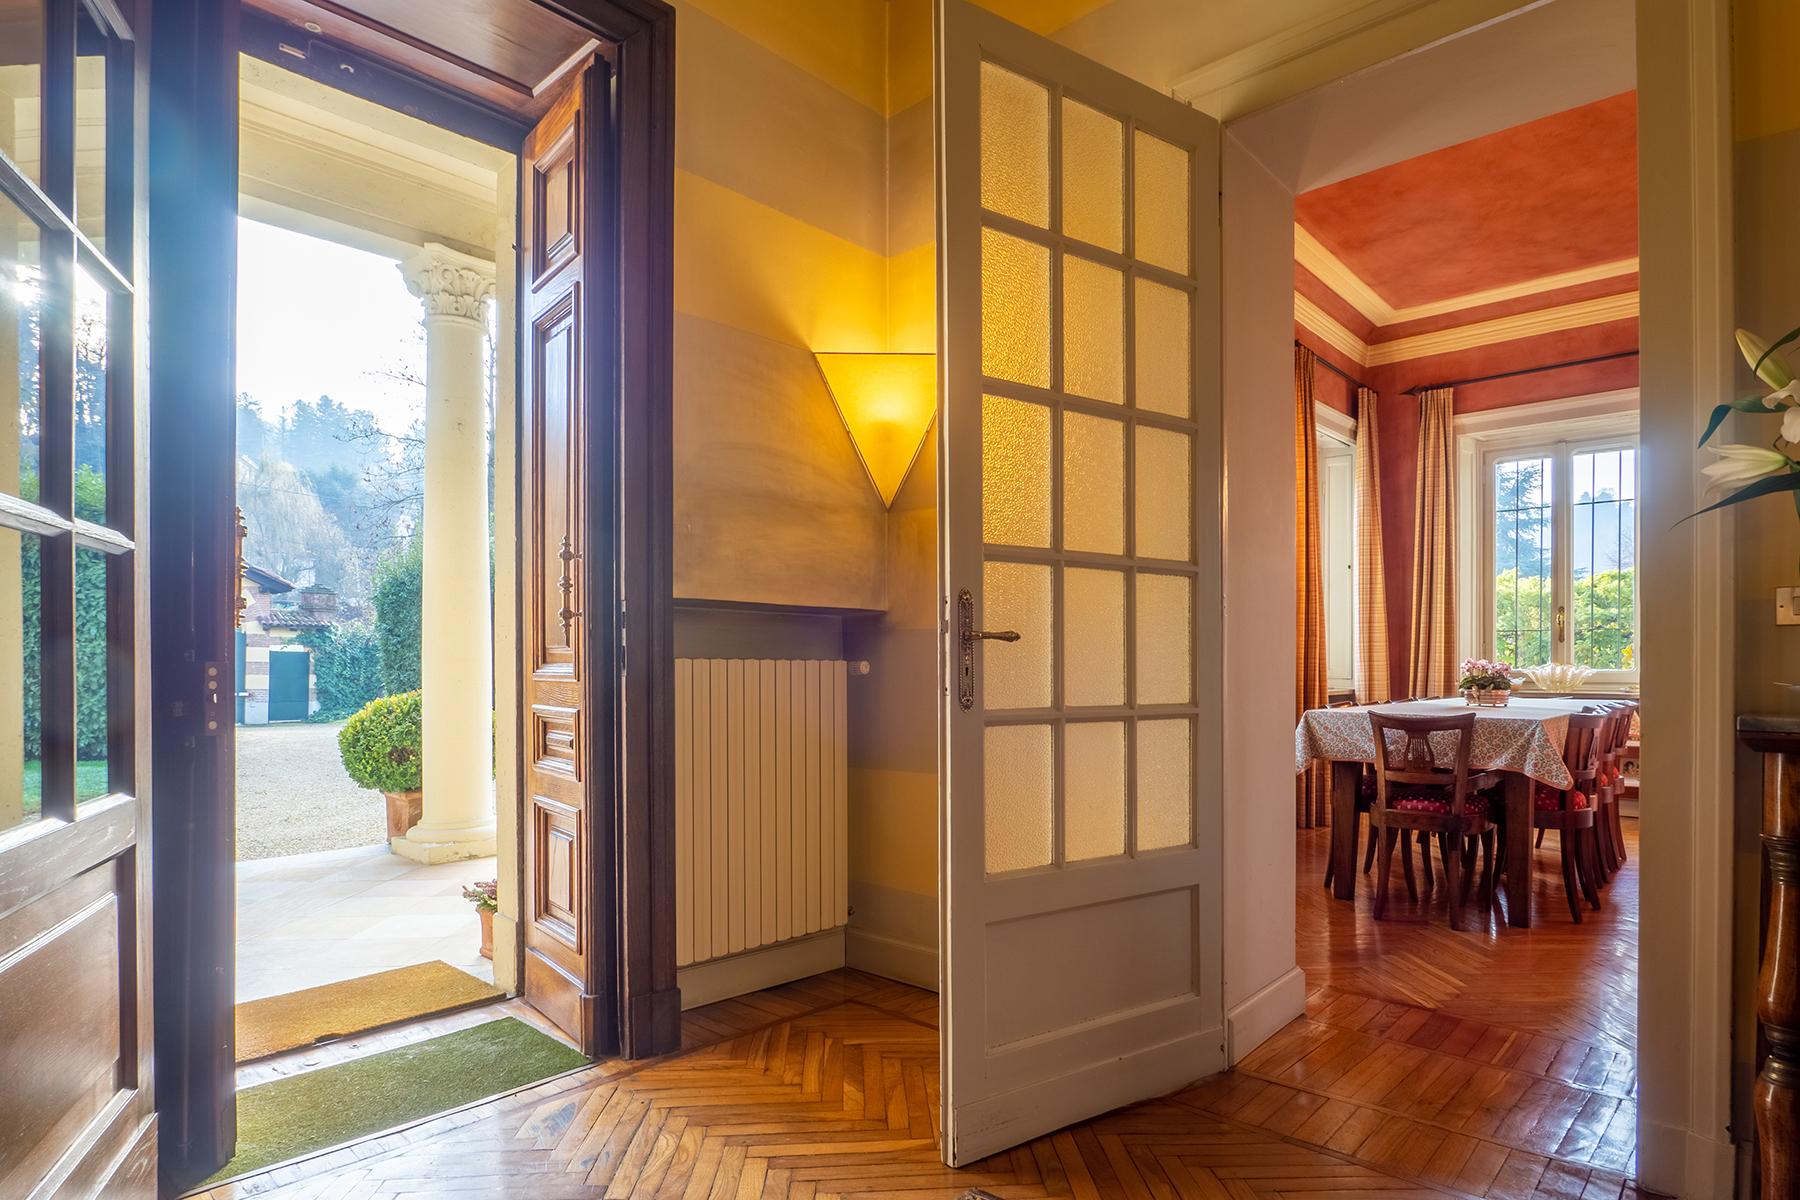 Casa indipendente in Vendita a Torino: 5 locali, 657 mq - Foto 9